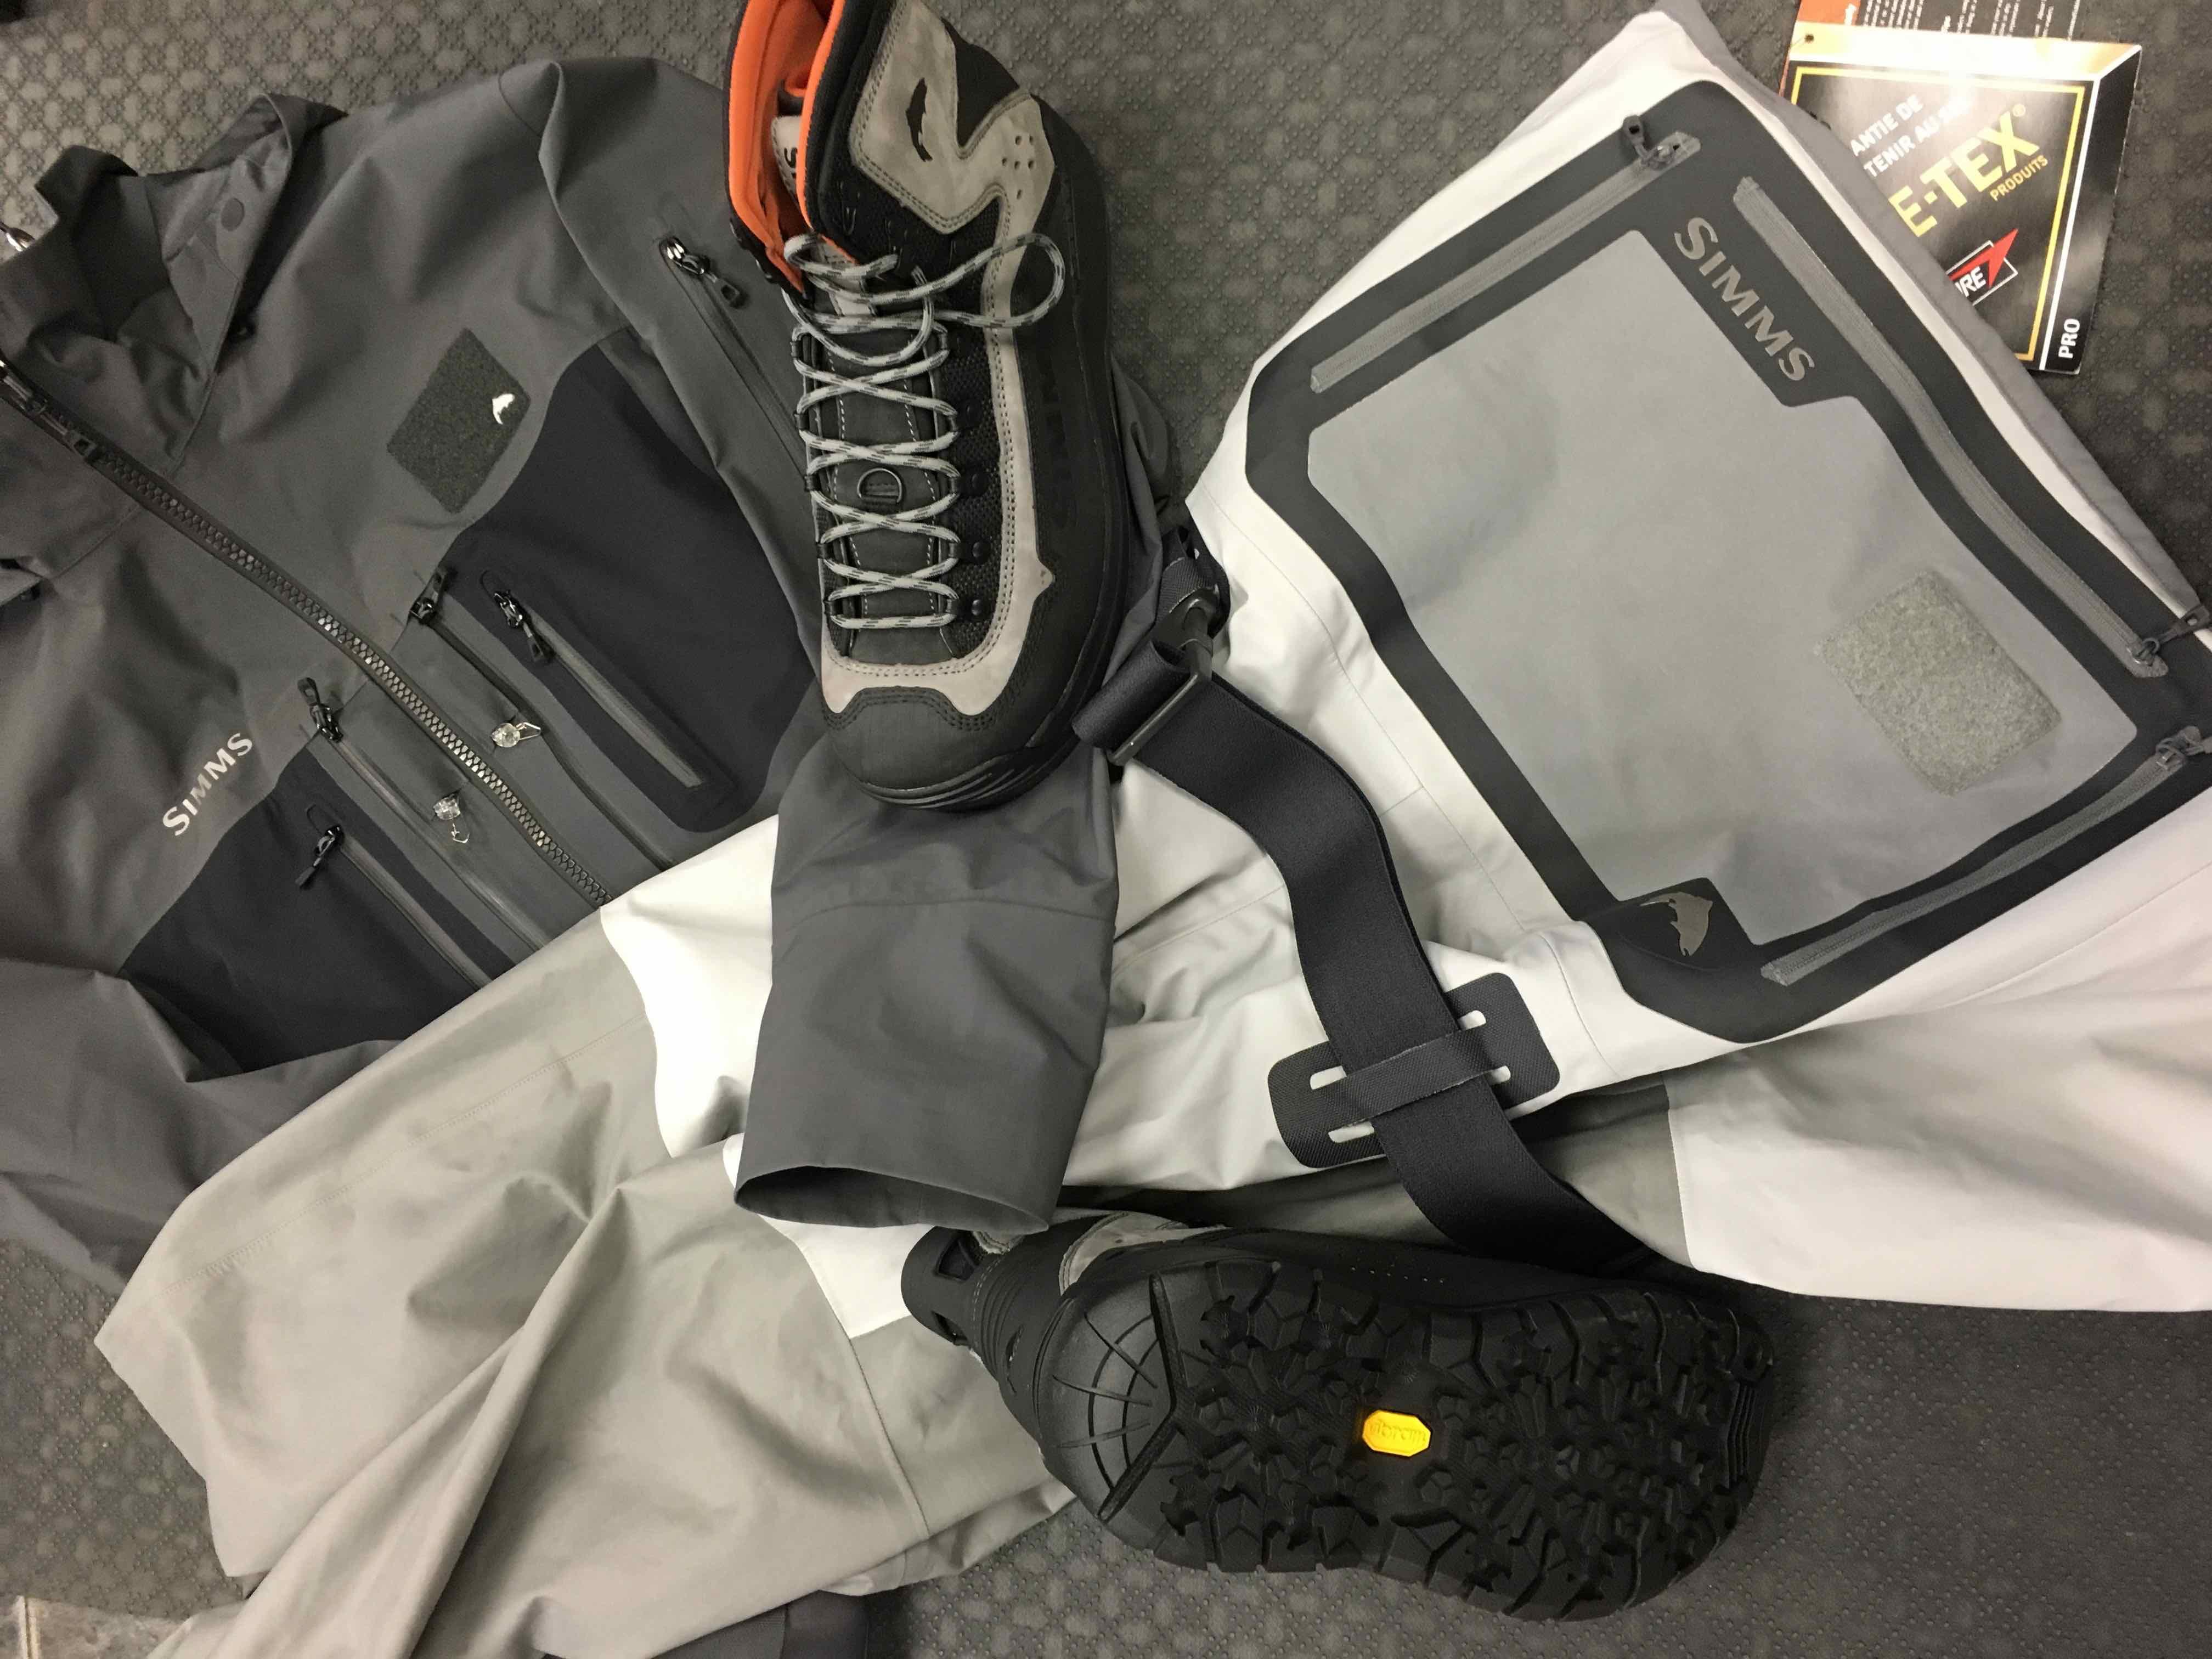 Simms 2018 G3 Series: Simms G3 Waders, Simms G3 Jacket& Simms G3 Wading Boots